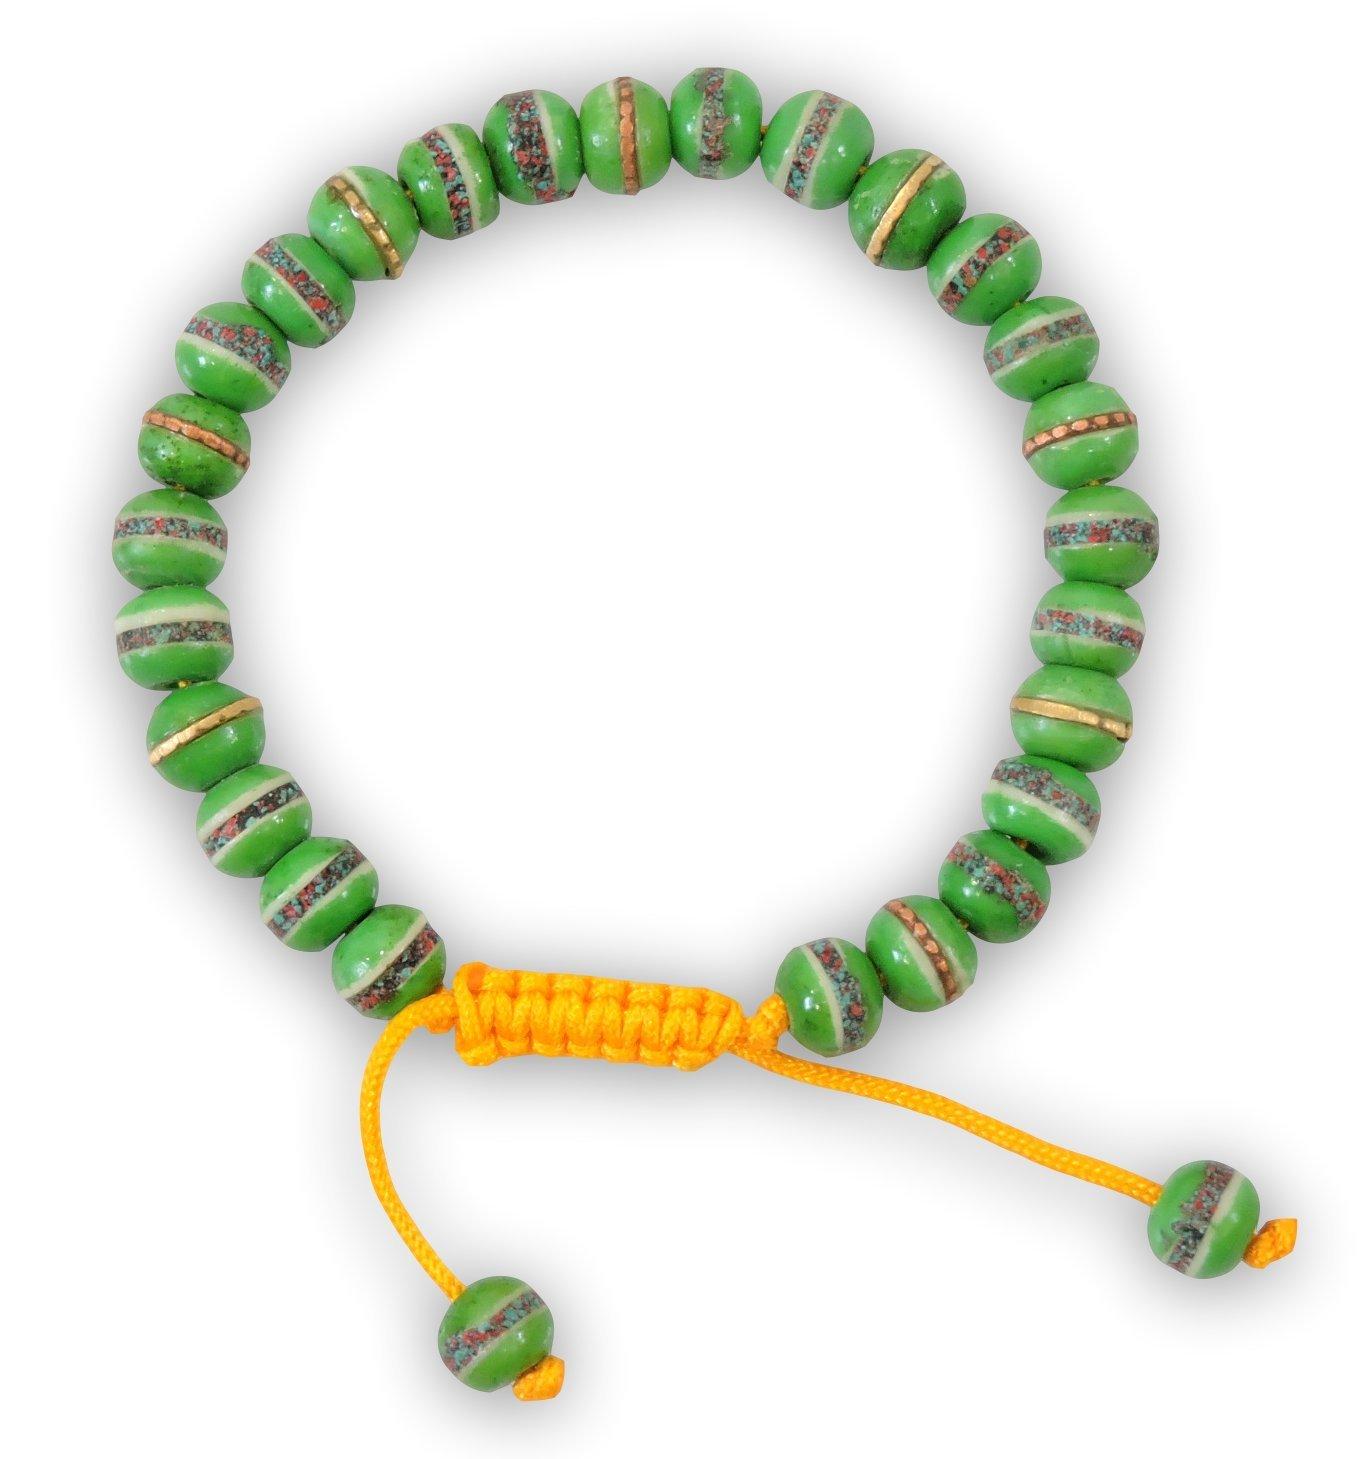 Tibetan Mala Embedded Medicine Wrist Mala for Meditation Handmade Draw String Silk Pouch (green medicine)